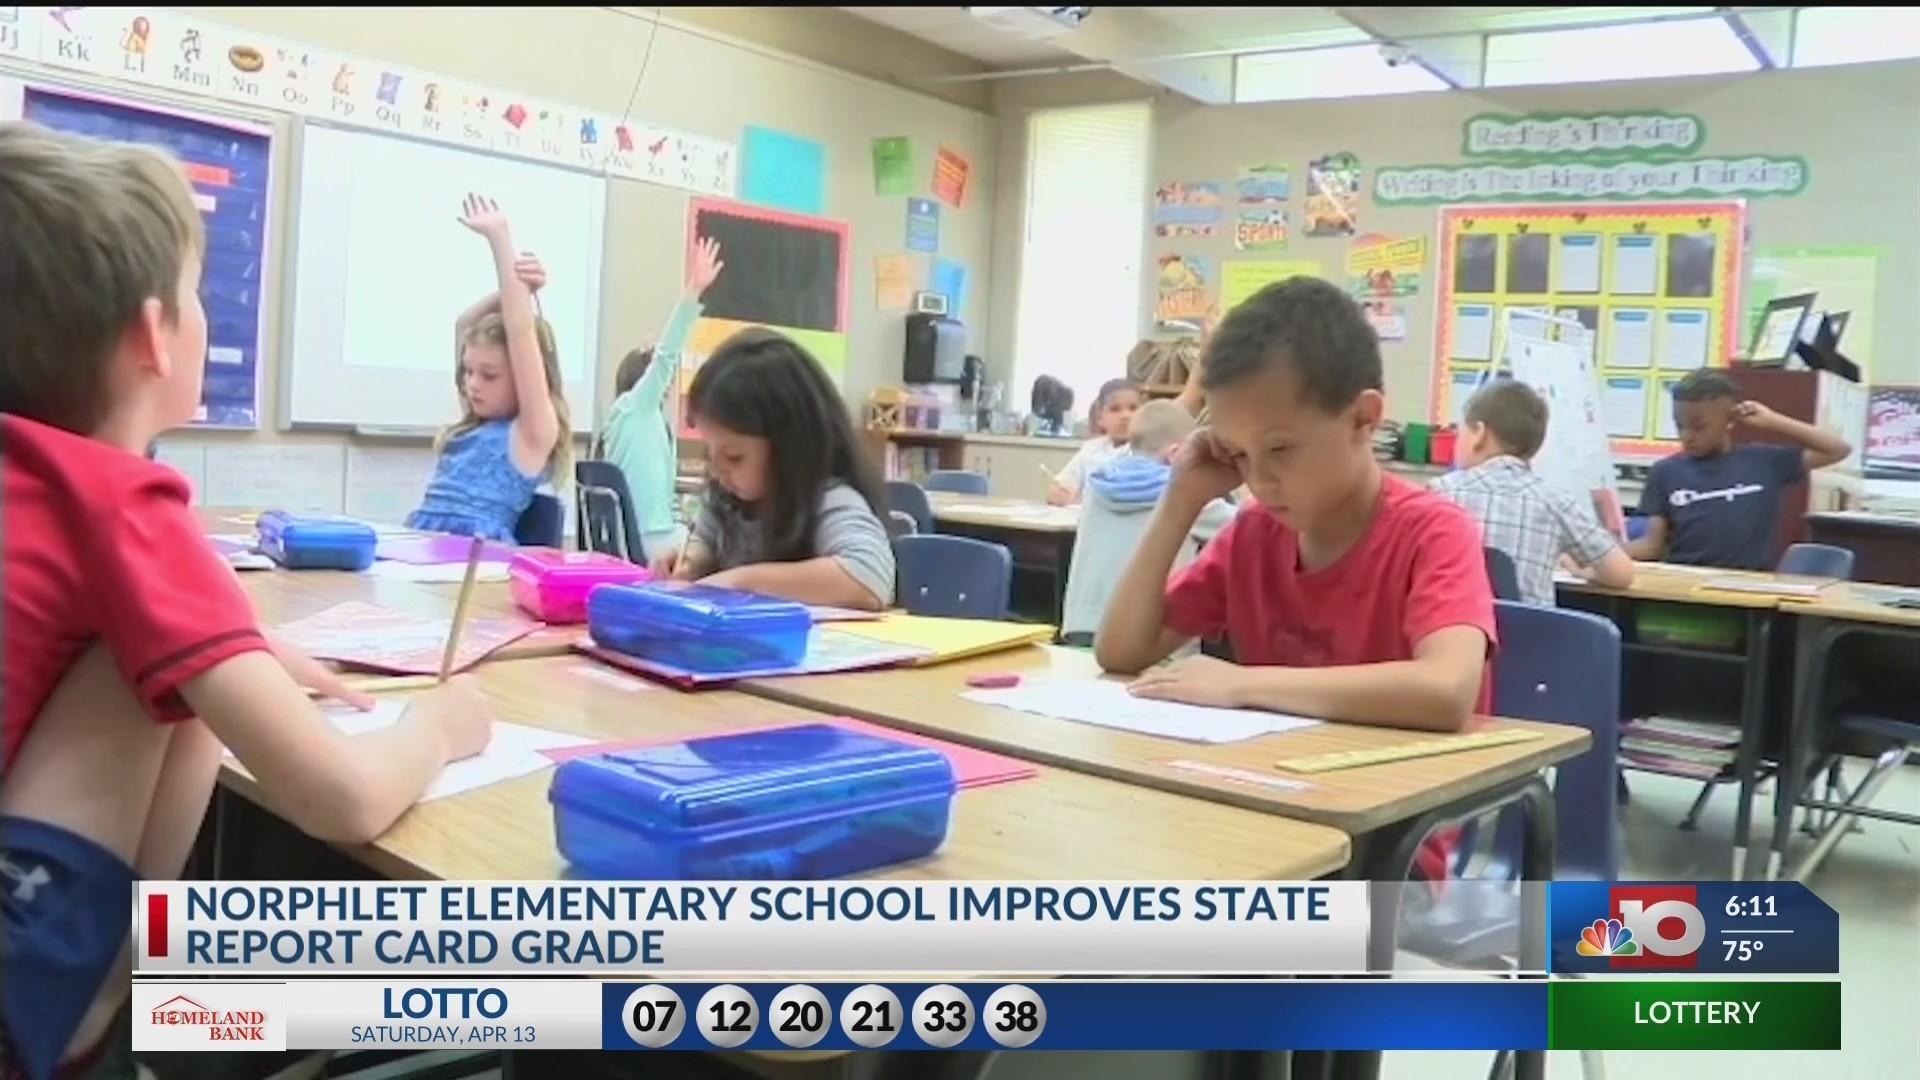 Arkansas releases performance report, Norphlet Elementary school saw improvements